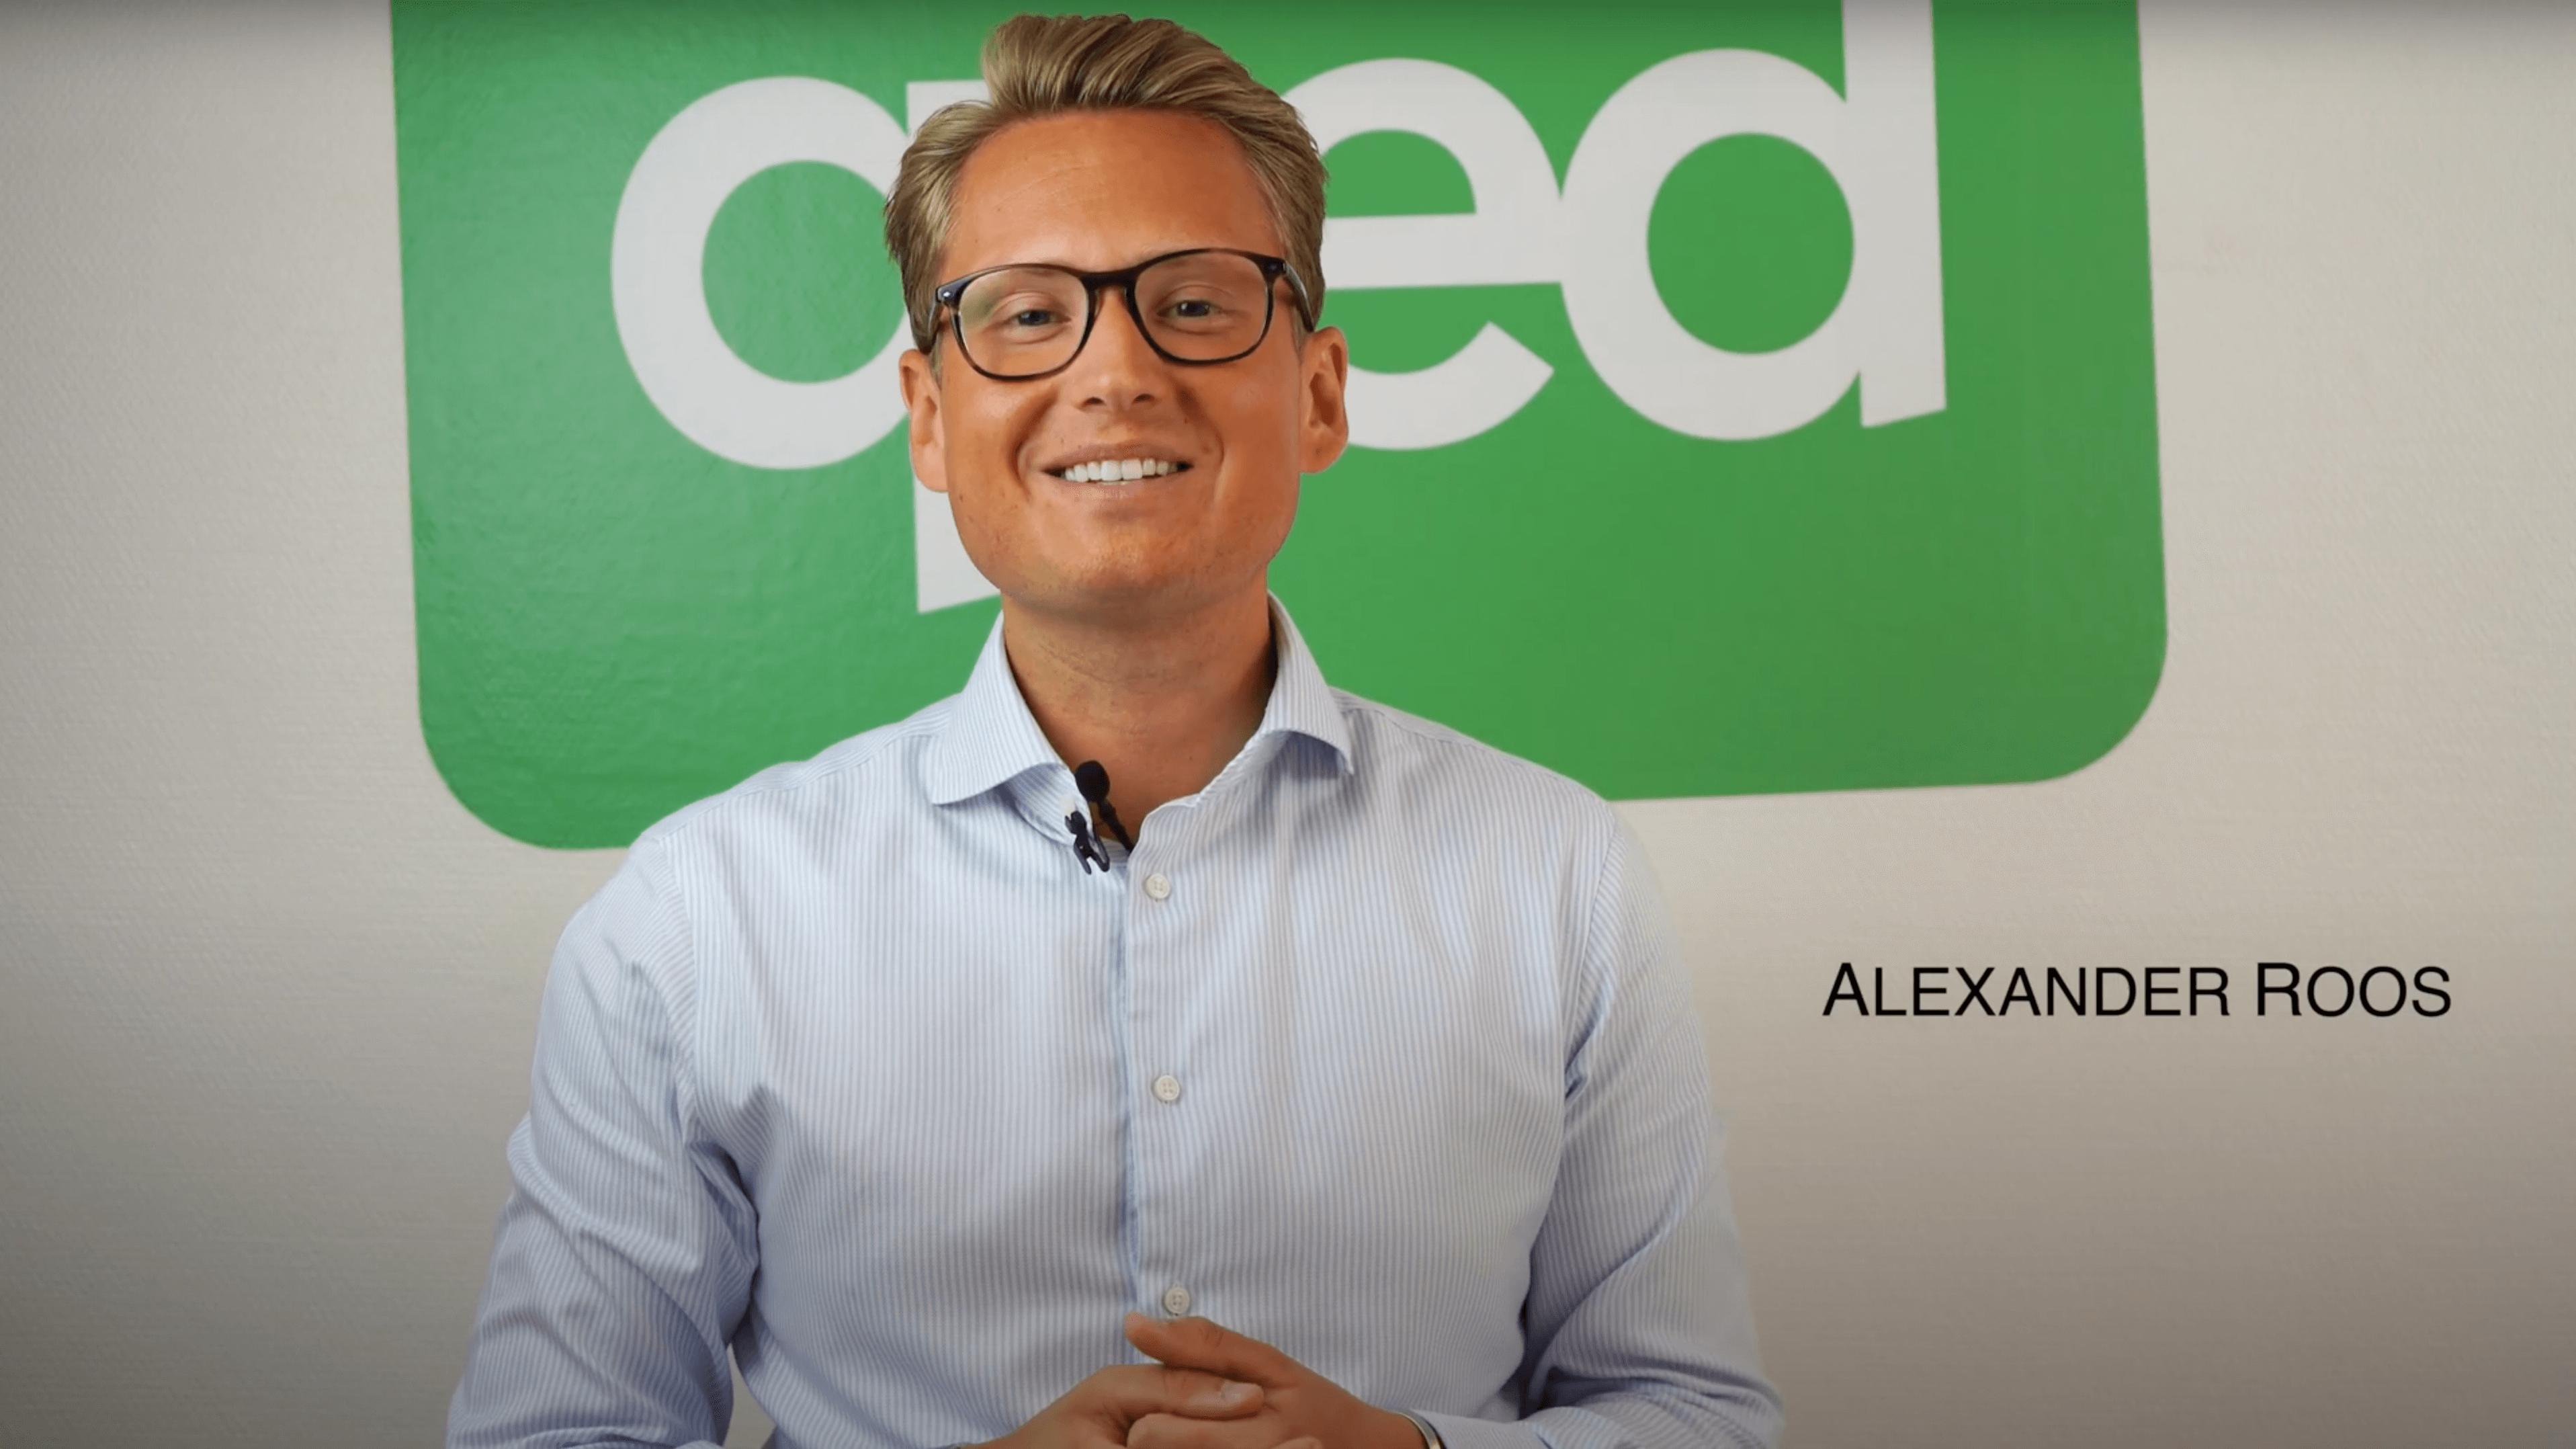 Alexander Roos om fakturabelåning